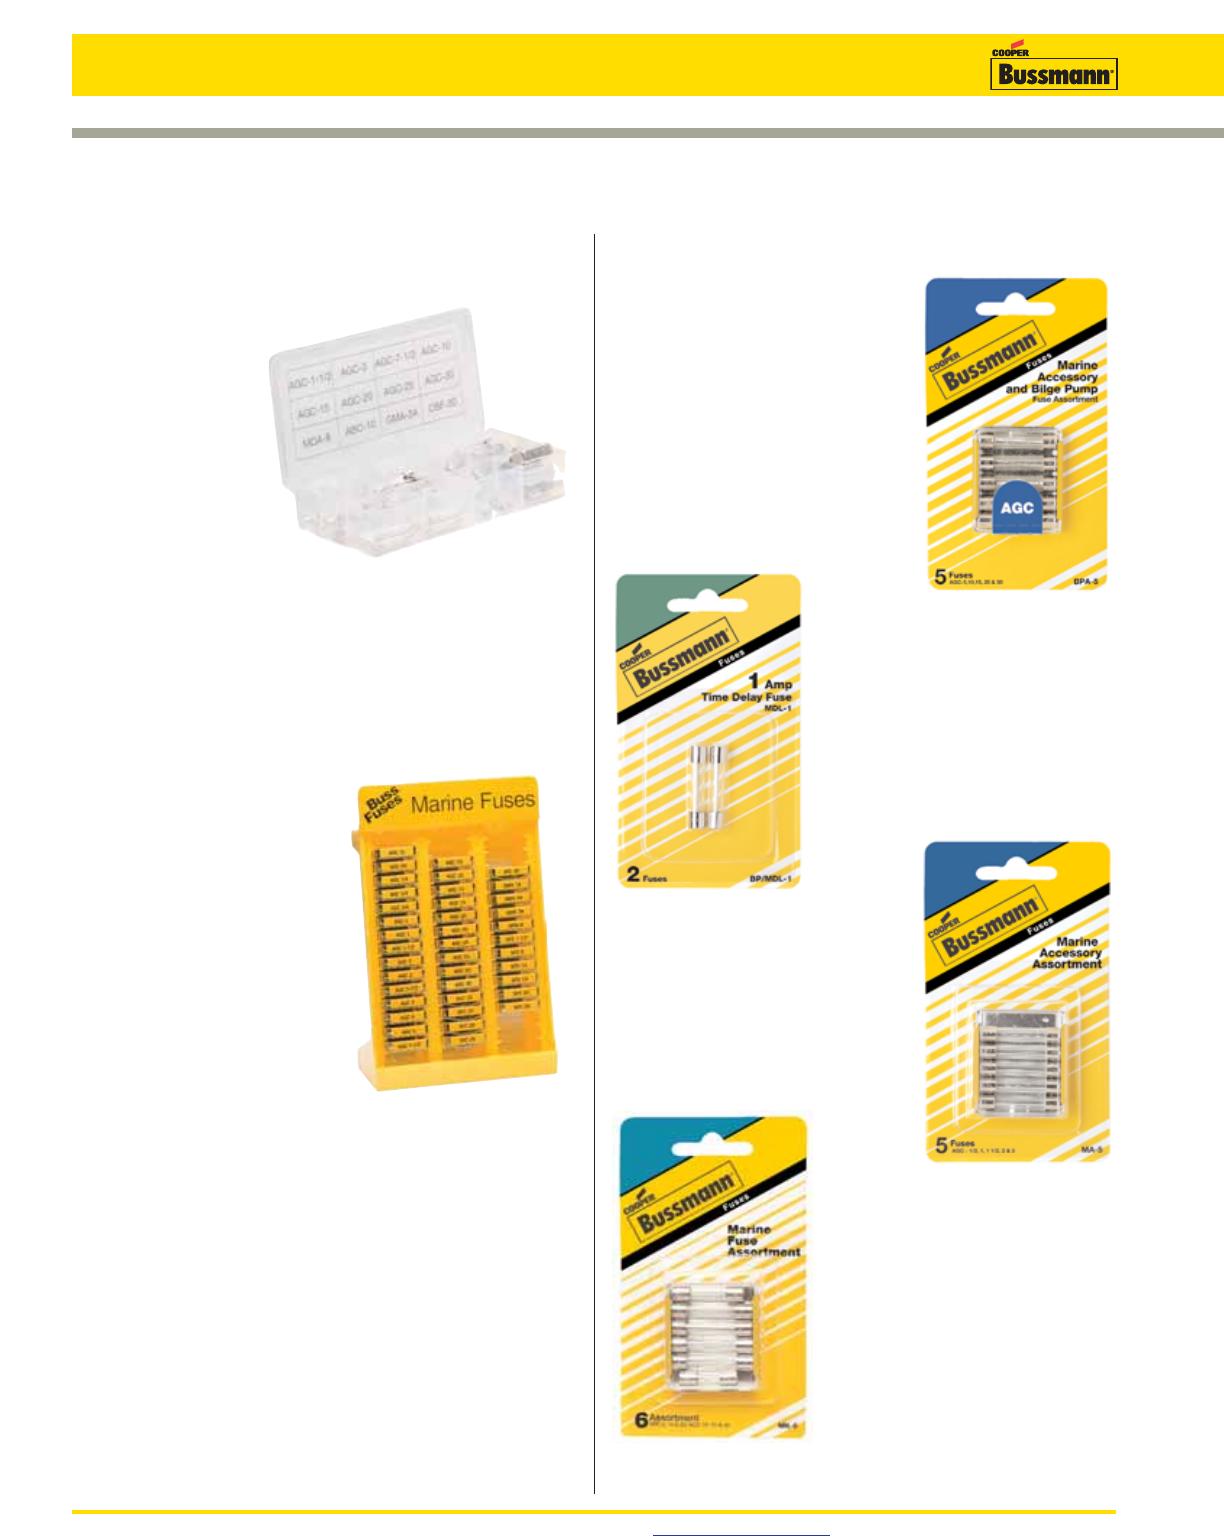 BUSSMANN W-1 Plug Fuse,W Series,1A,PK4